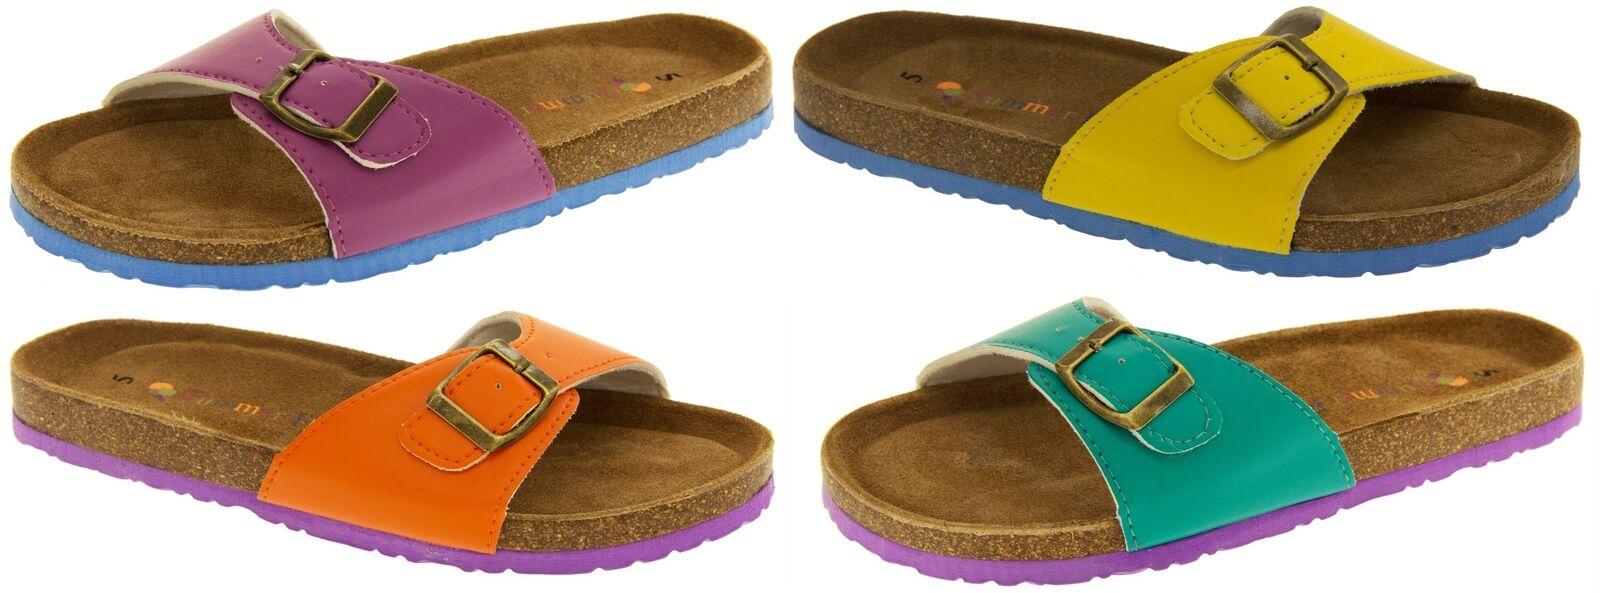 Ladies Coolers Summer Flip Mules Ladies Faux Leather Flip Summer Flops Sandals Sz 4 5 6 7 8 f6df29